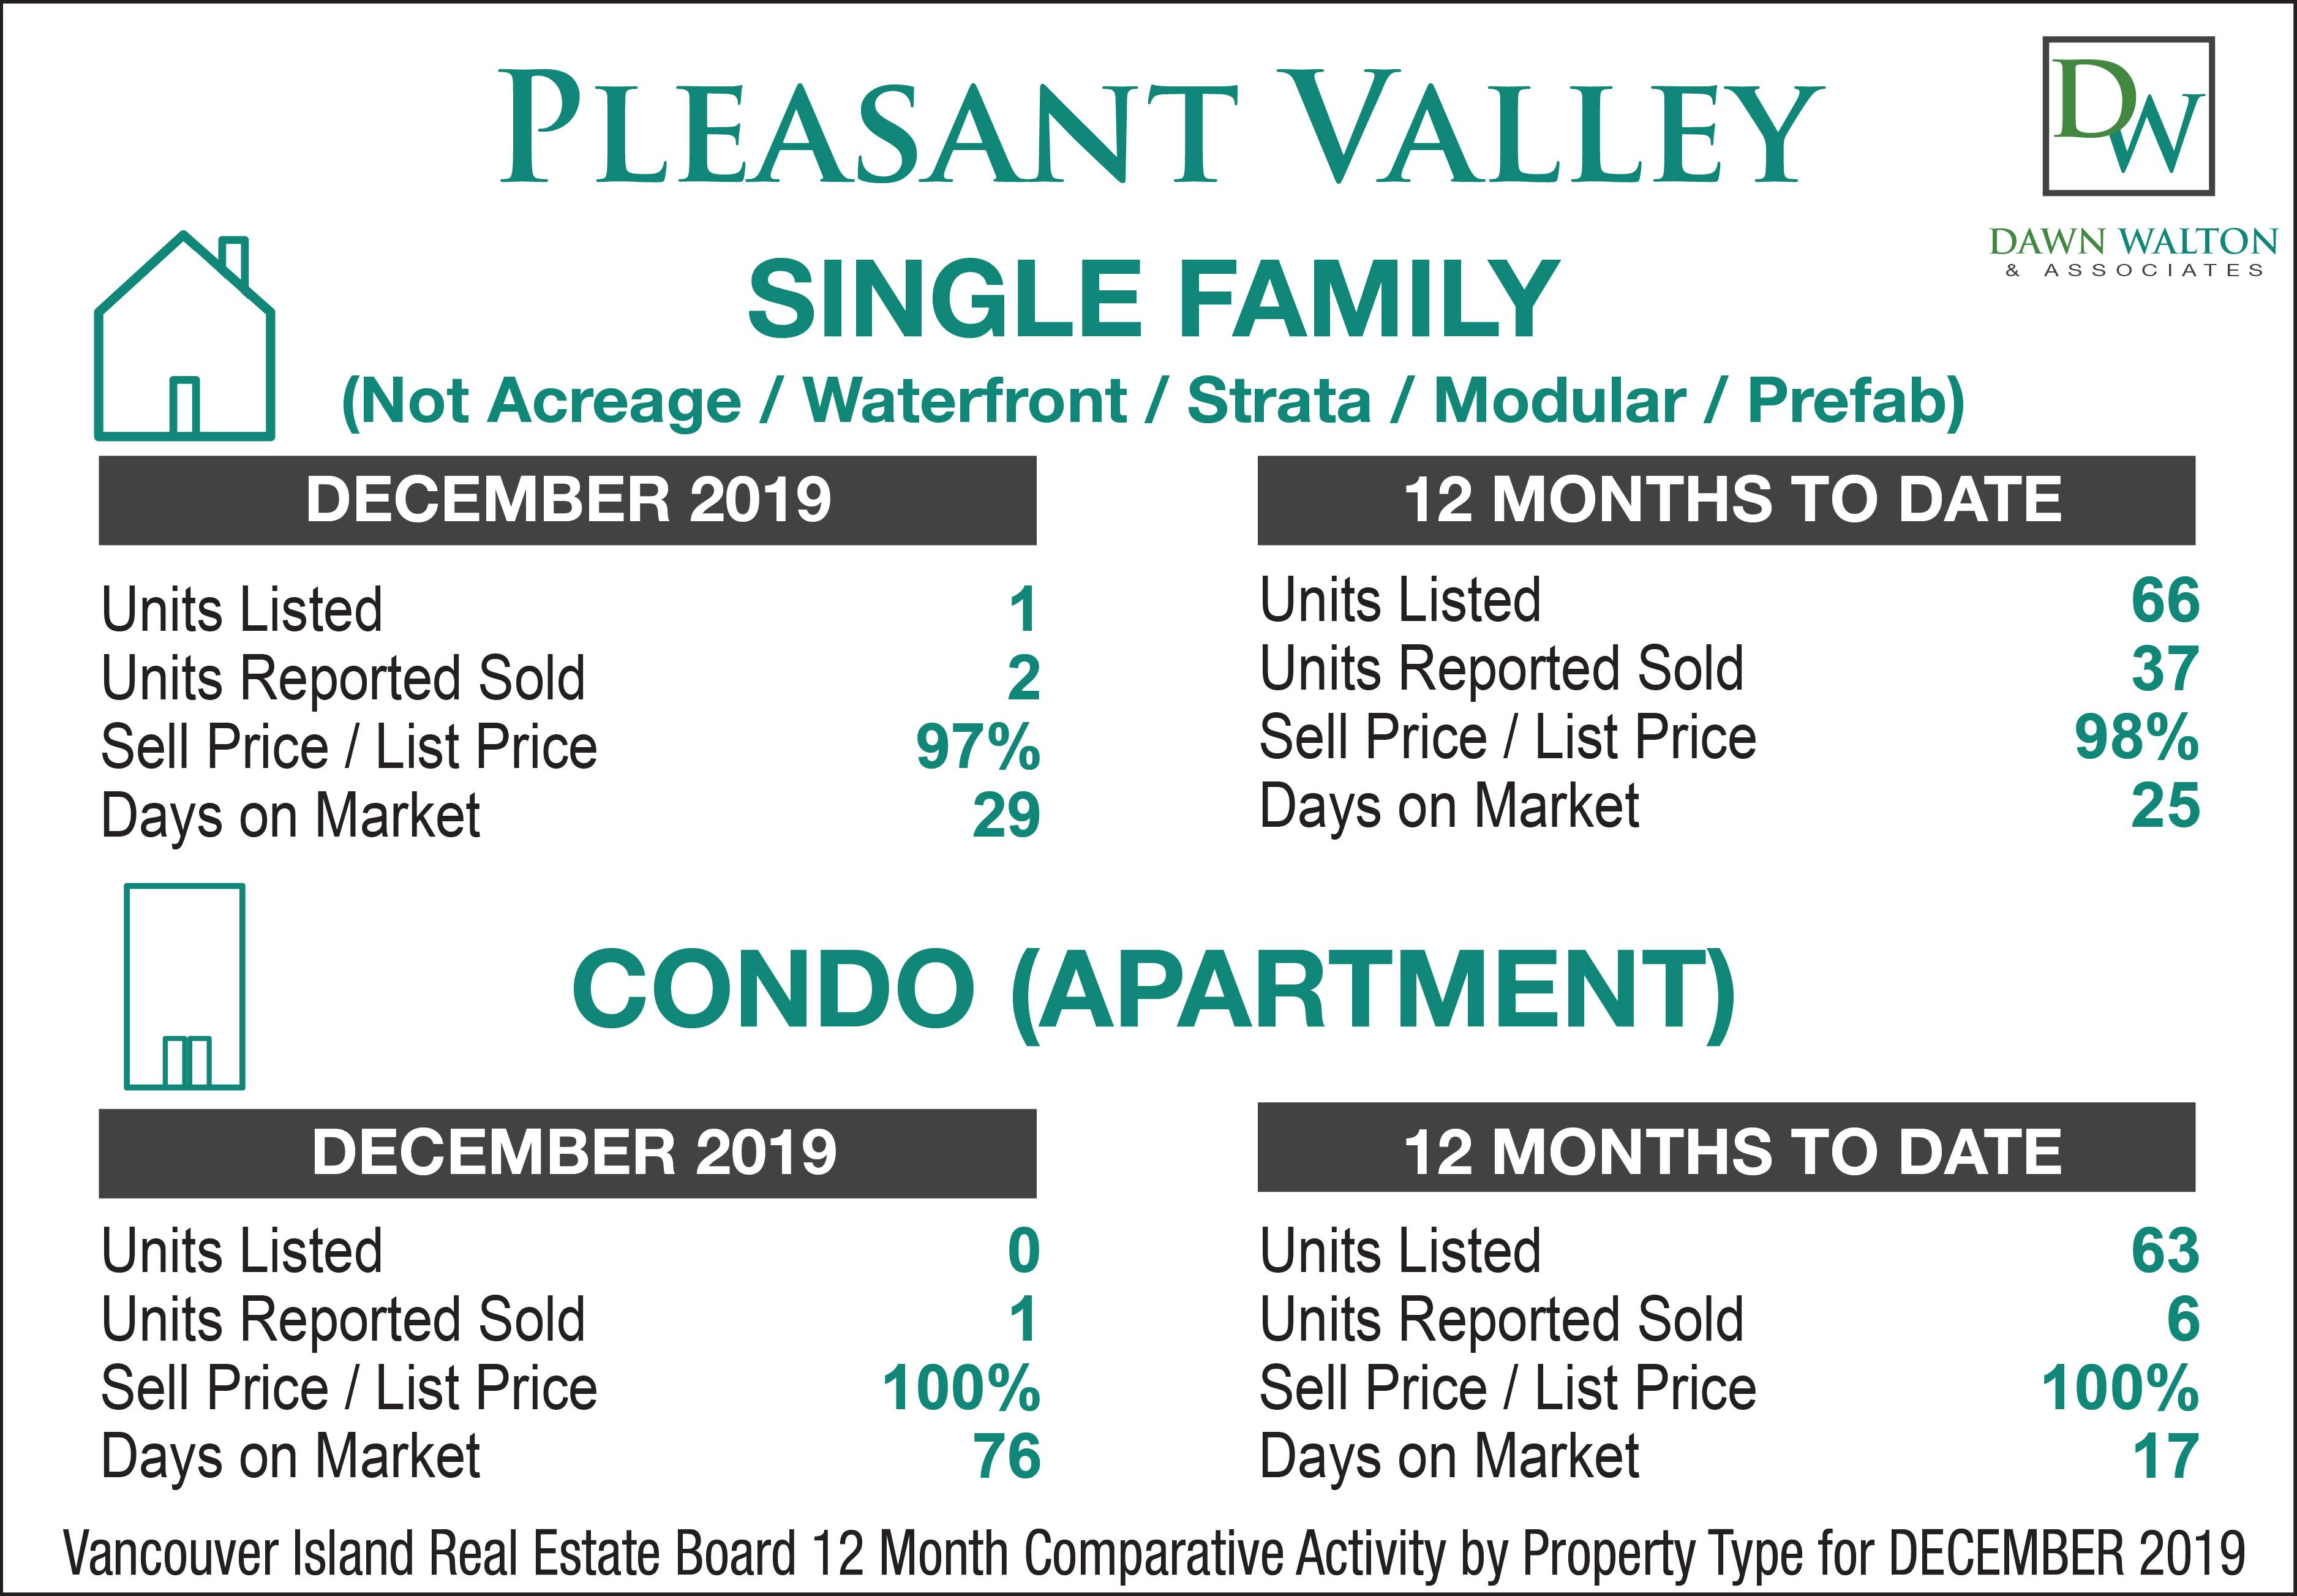 Pleasant Valley Real Estate Market Stats December  2019 - Nanaimo Realtor Dawn Walton